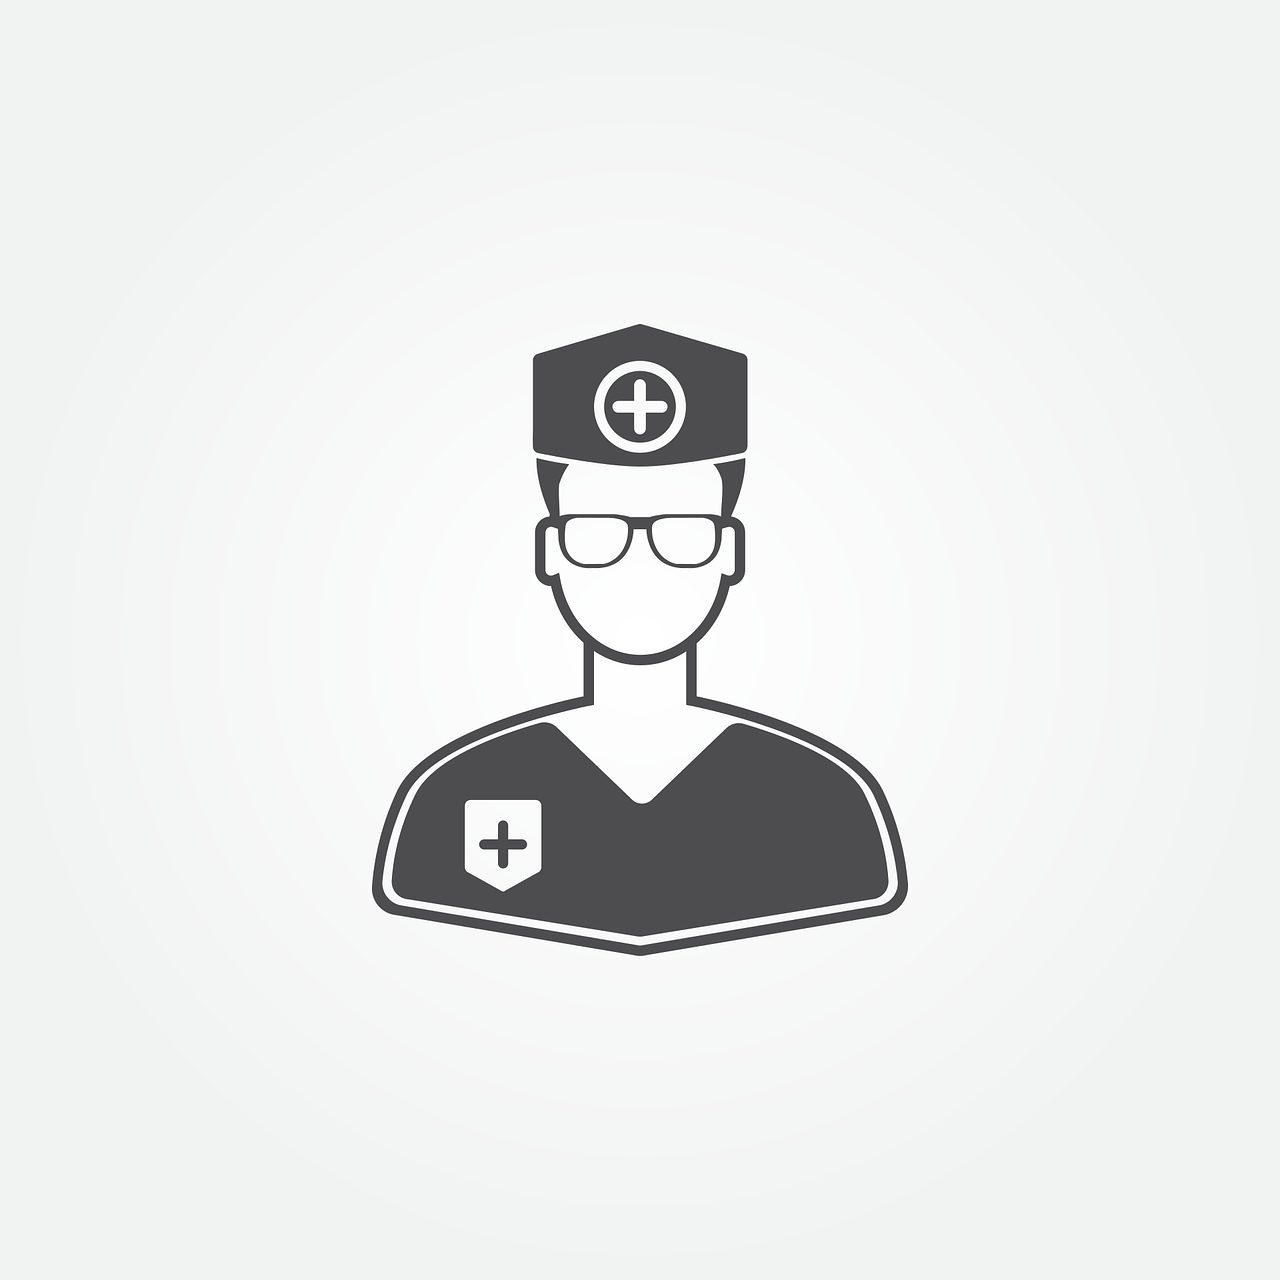 Parodon-en Implantologie Praktijk voor tandarts lachgas